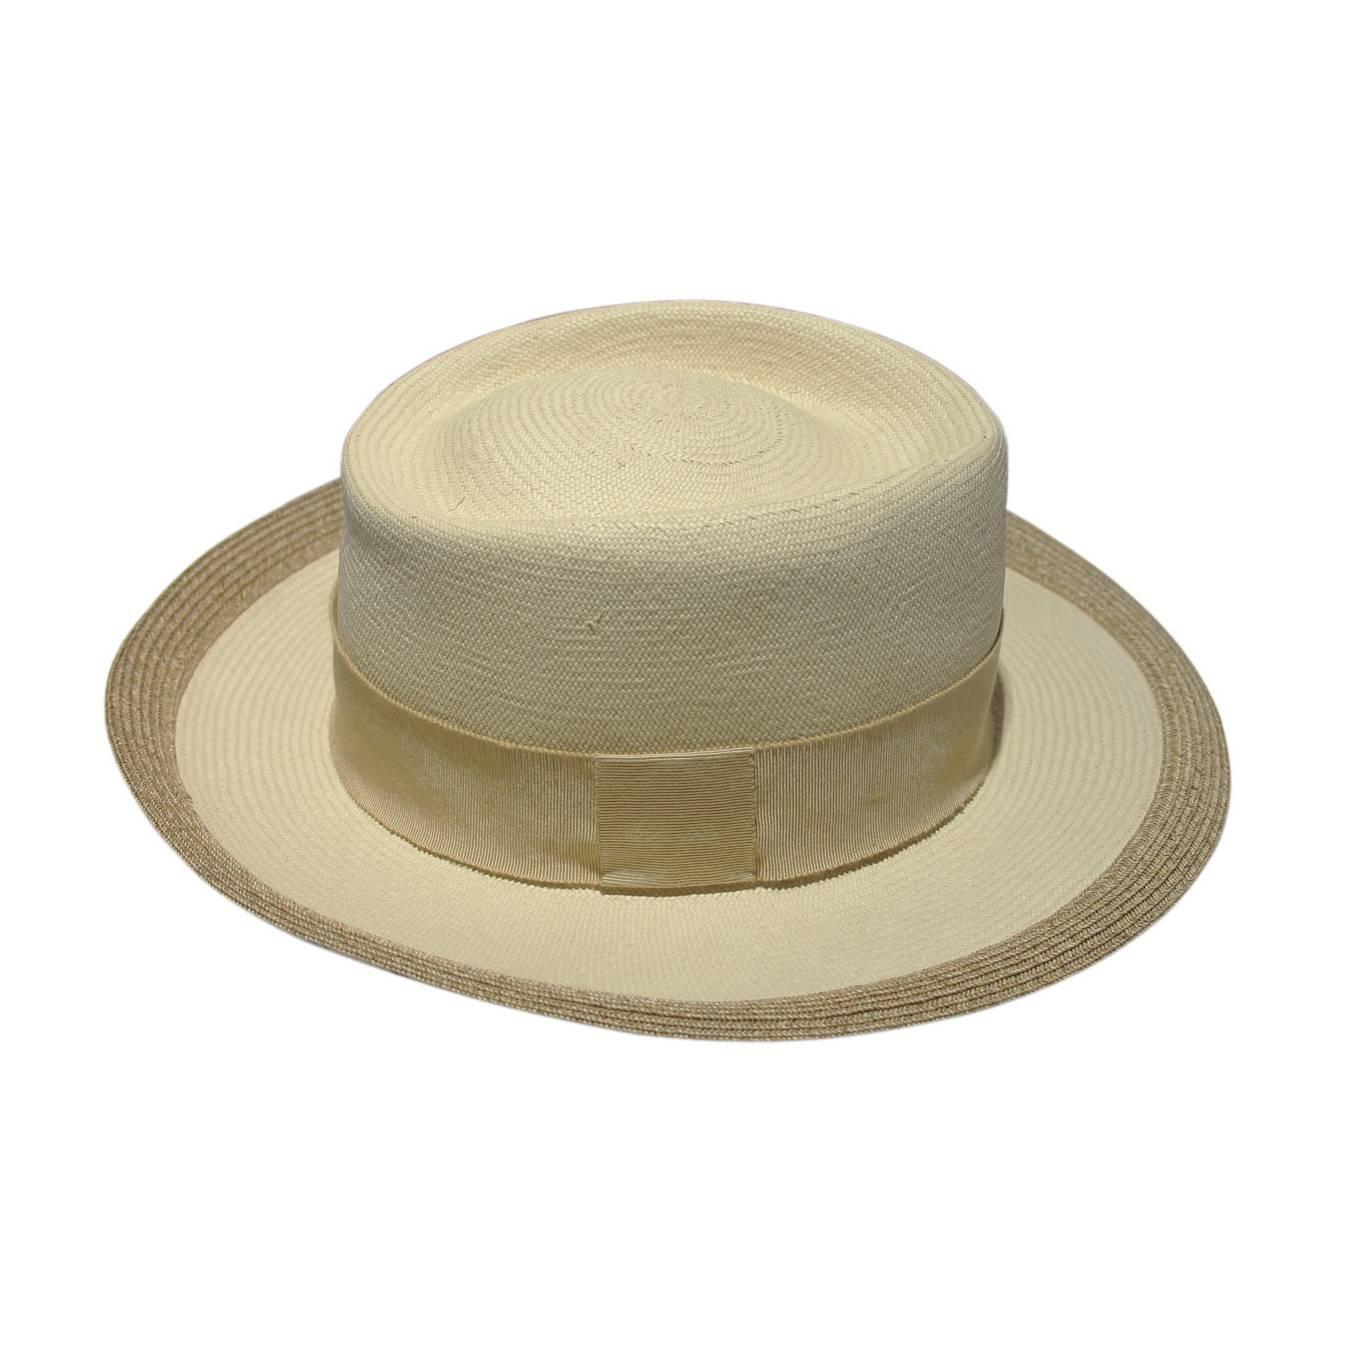 cheap hermes handbags - Hermes 100% Panama Straw Weave Hat at 1stdibs